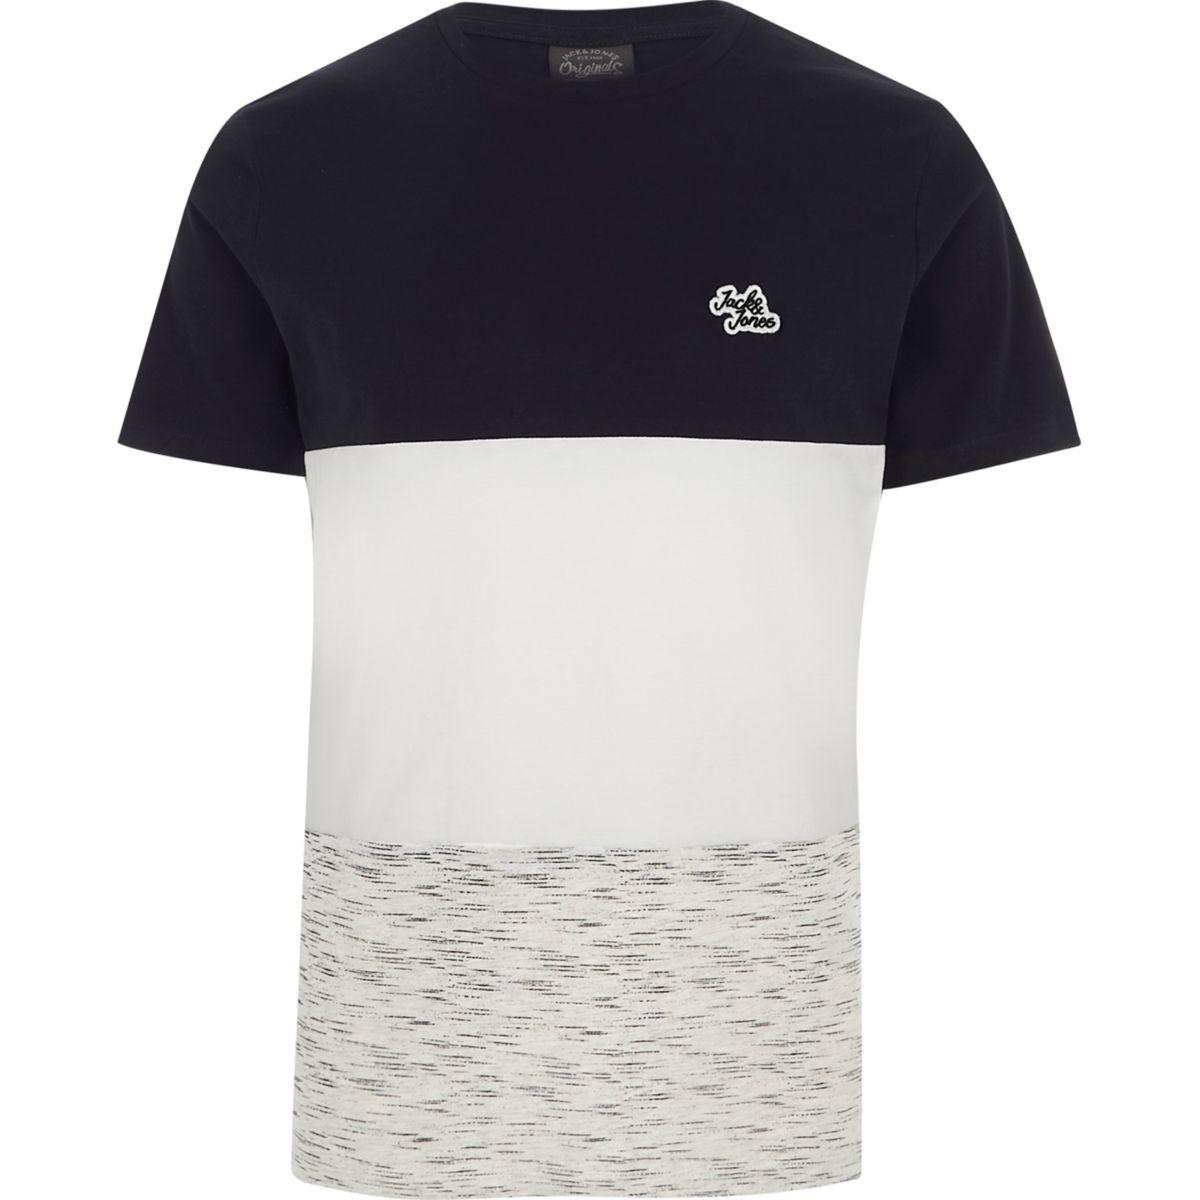 Navy Jack & Jones blocked T-shirt